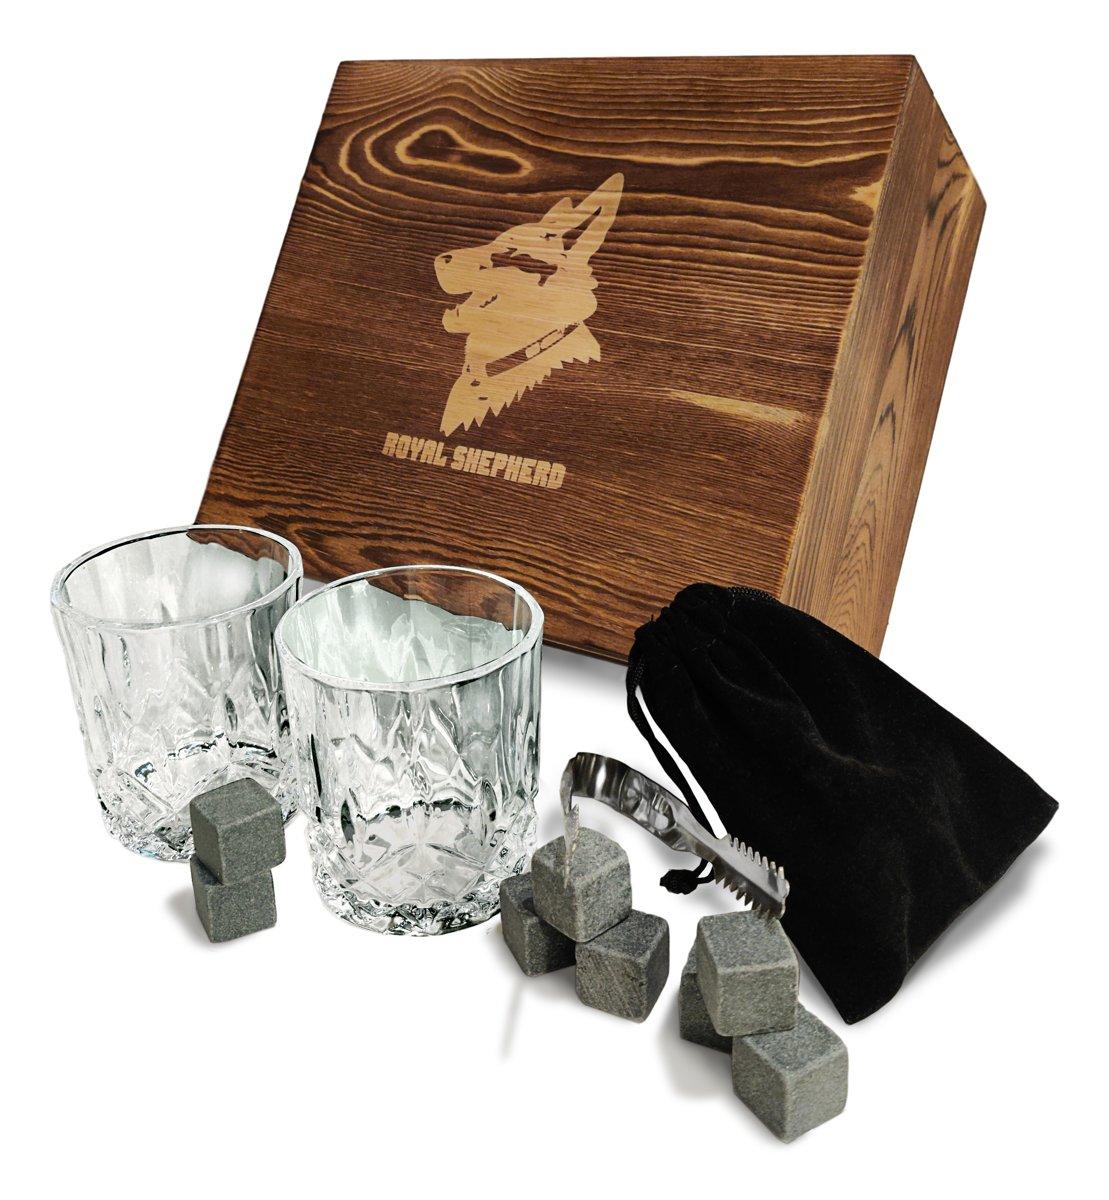 Whiskey Set - 2 Glazen - 8 Whiskey Stones - Cadeauset - Royal Shepherd – Natuursteen - Tang - Whisky kopen